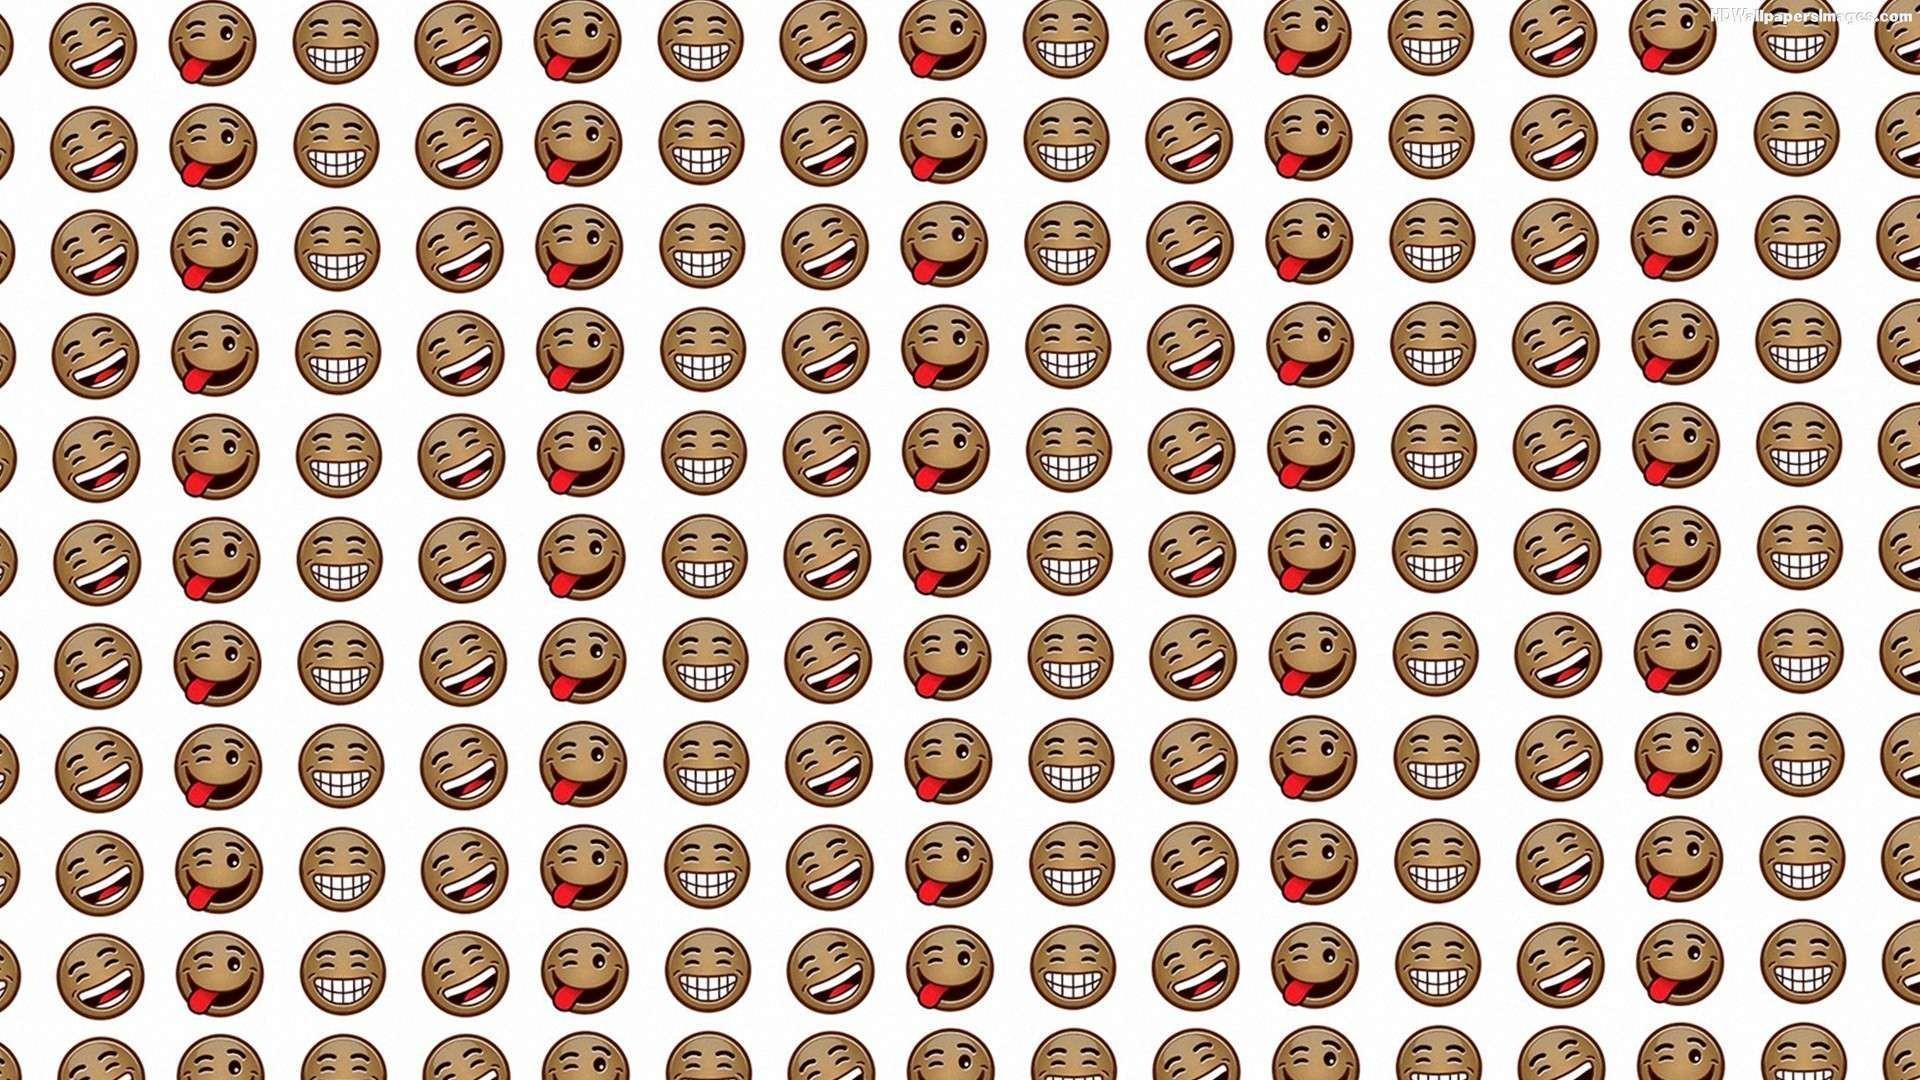 Emoji Wallpapers 1080p | HDWallWide.com